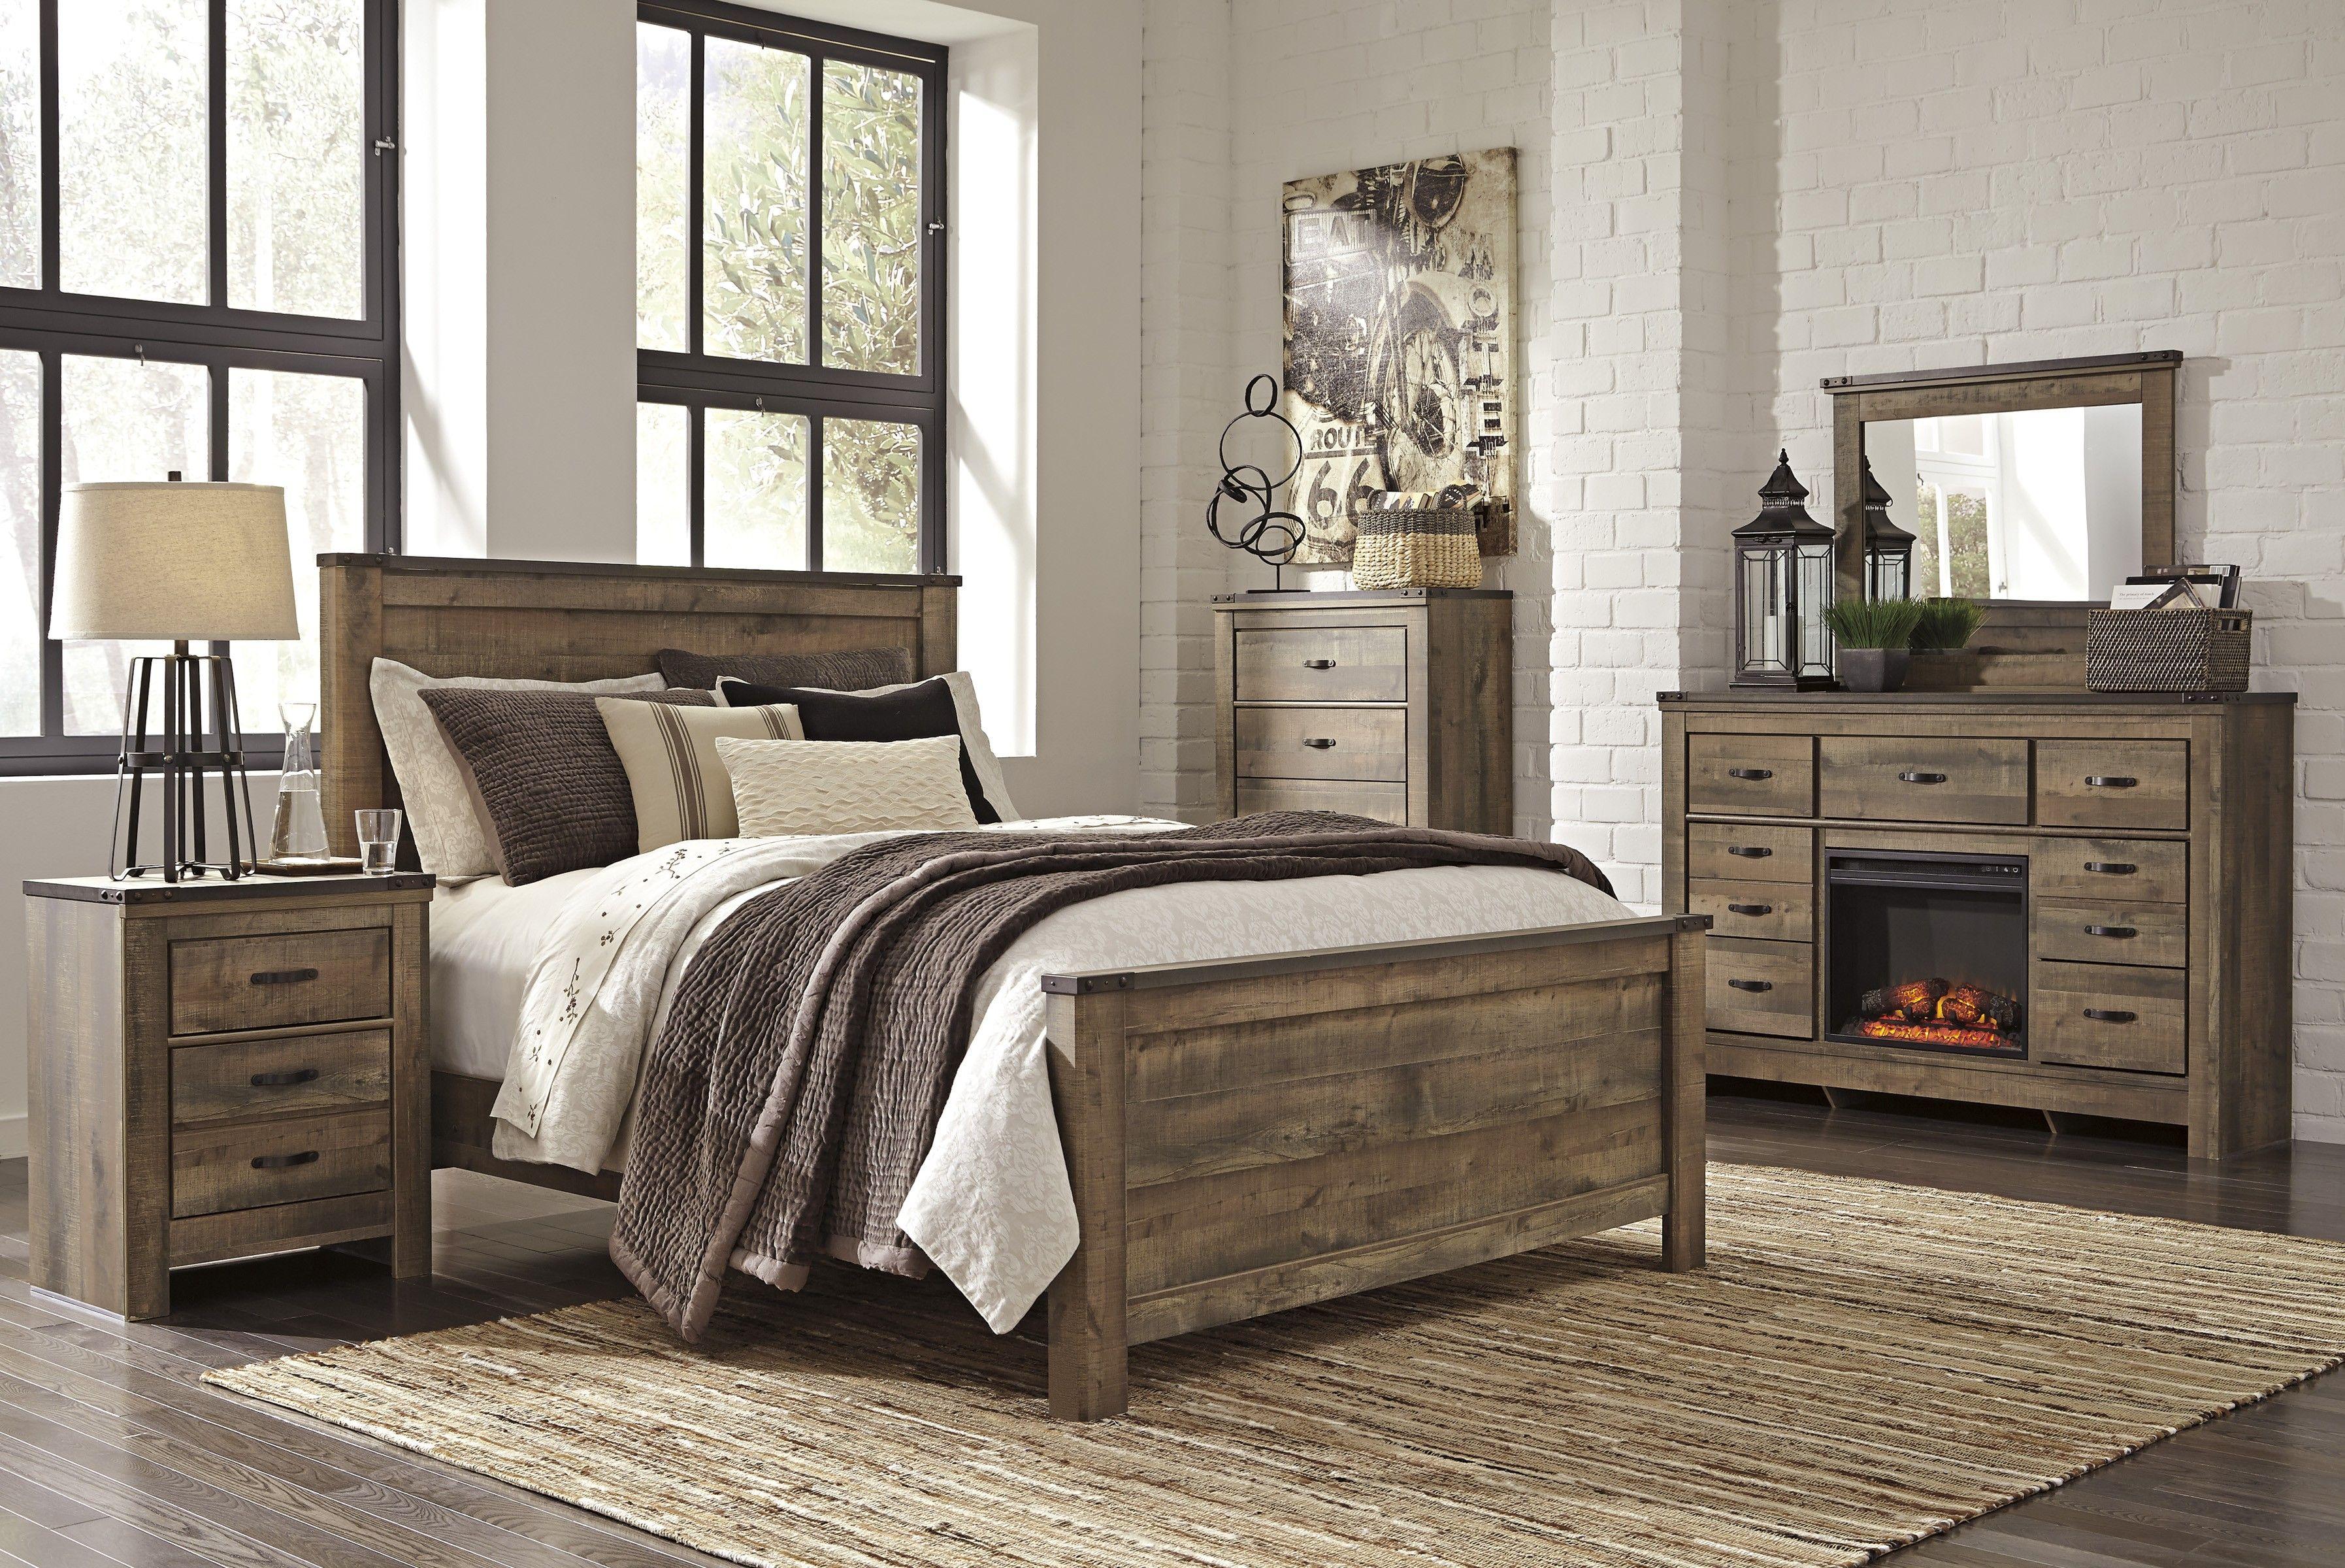 Trinell Panel Bed King Bedroom Sets Rustic Master Bedroom Wood